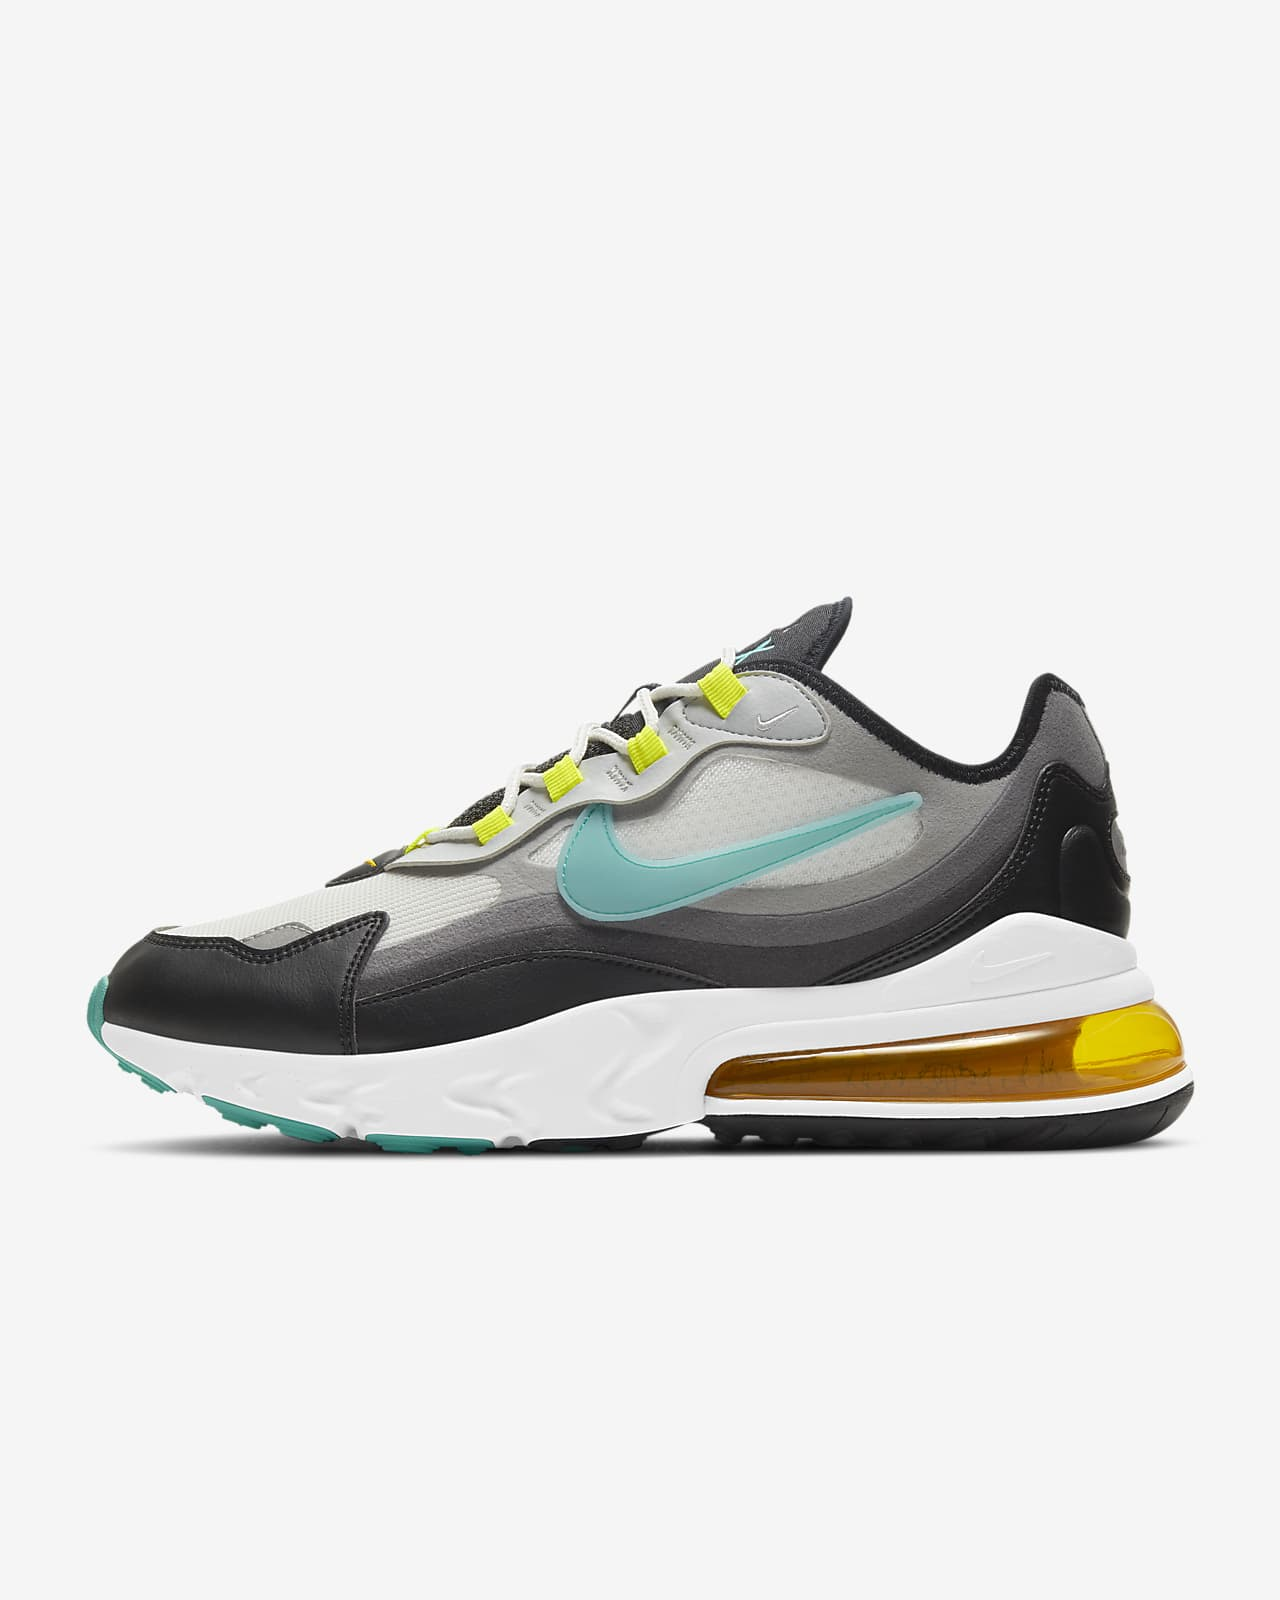 Nike Air Max 270 React EOI Men's Shoe